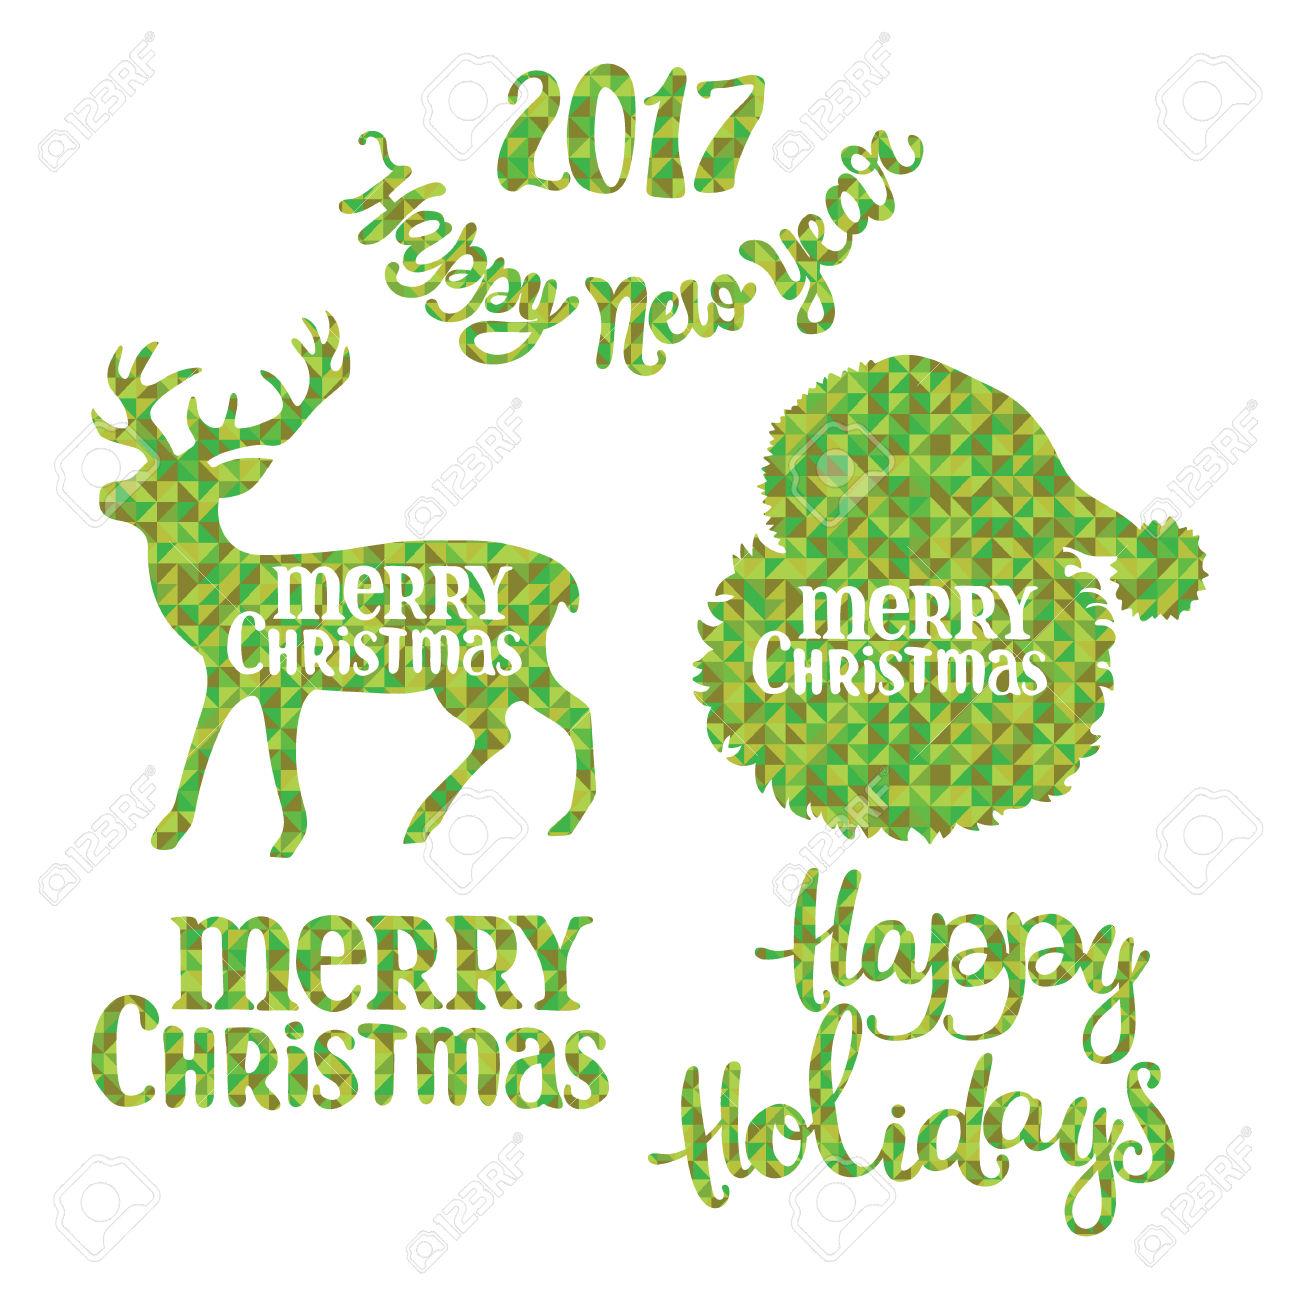 Merry Christmas. Happy New Year. Happy Holidays. Santa Claus.